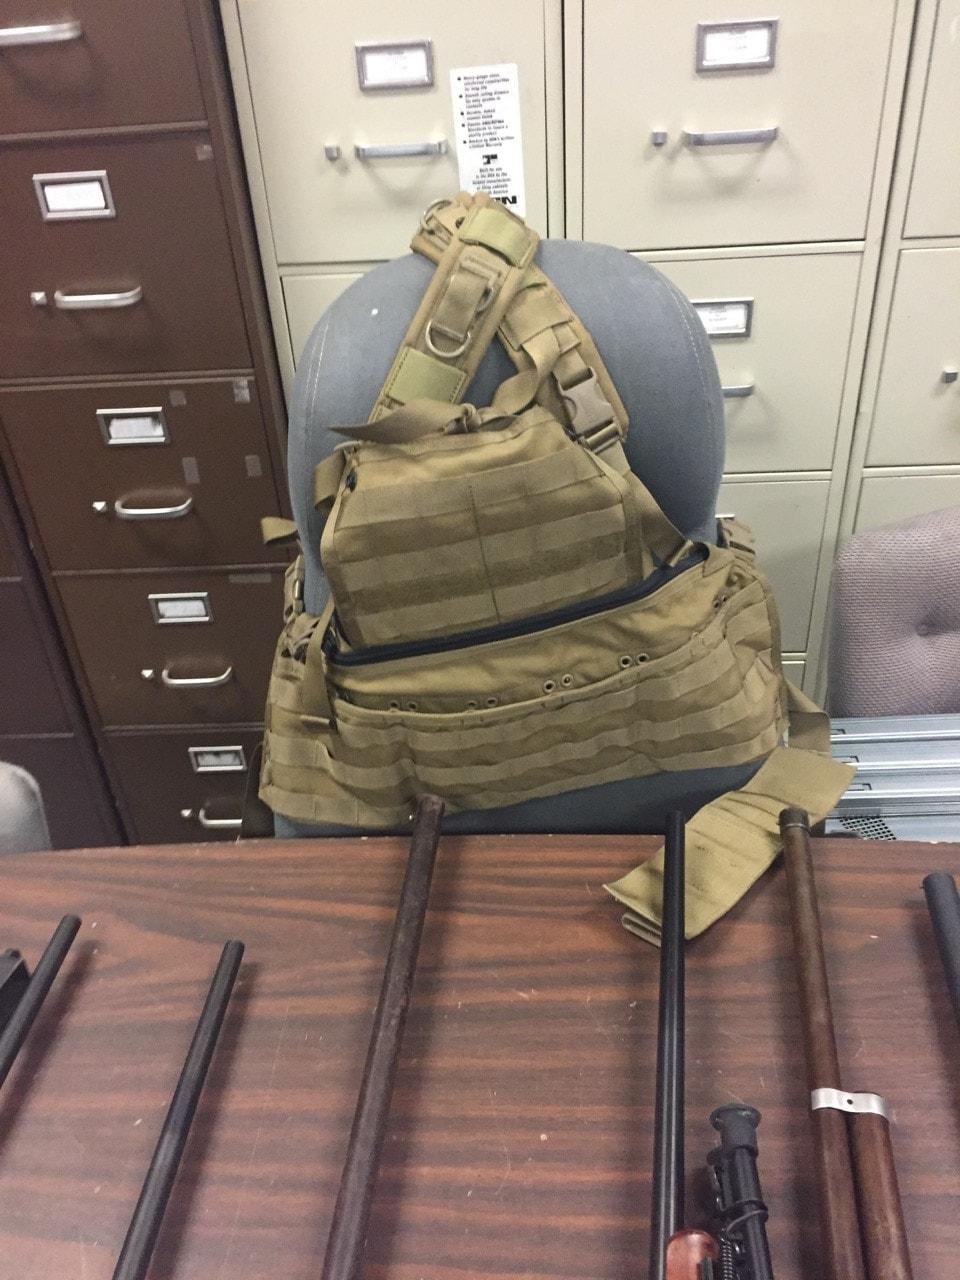 kentucky-state-police-run-in-felon-with-26-guns-3